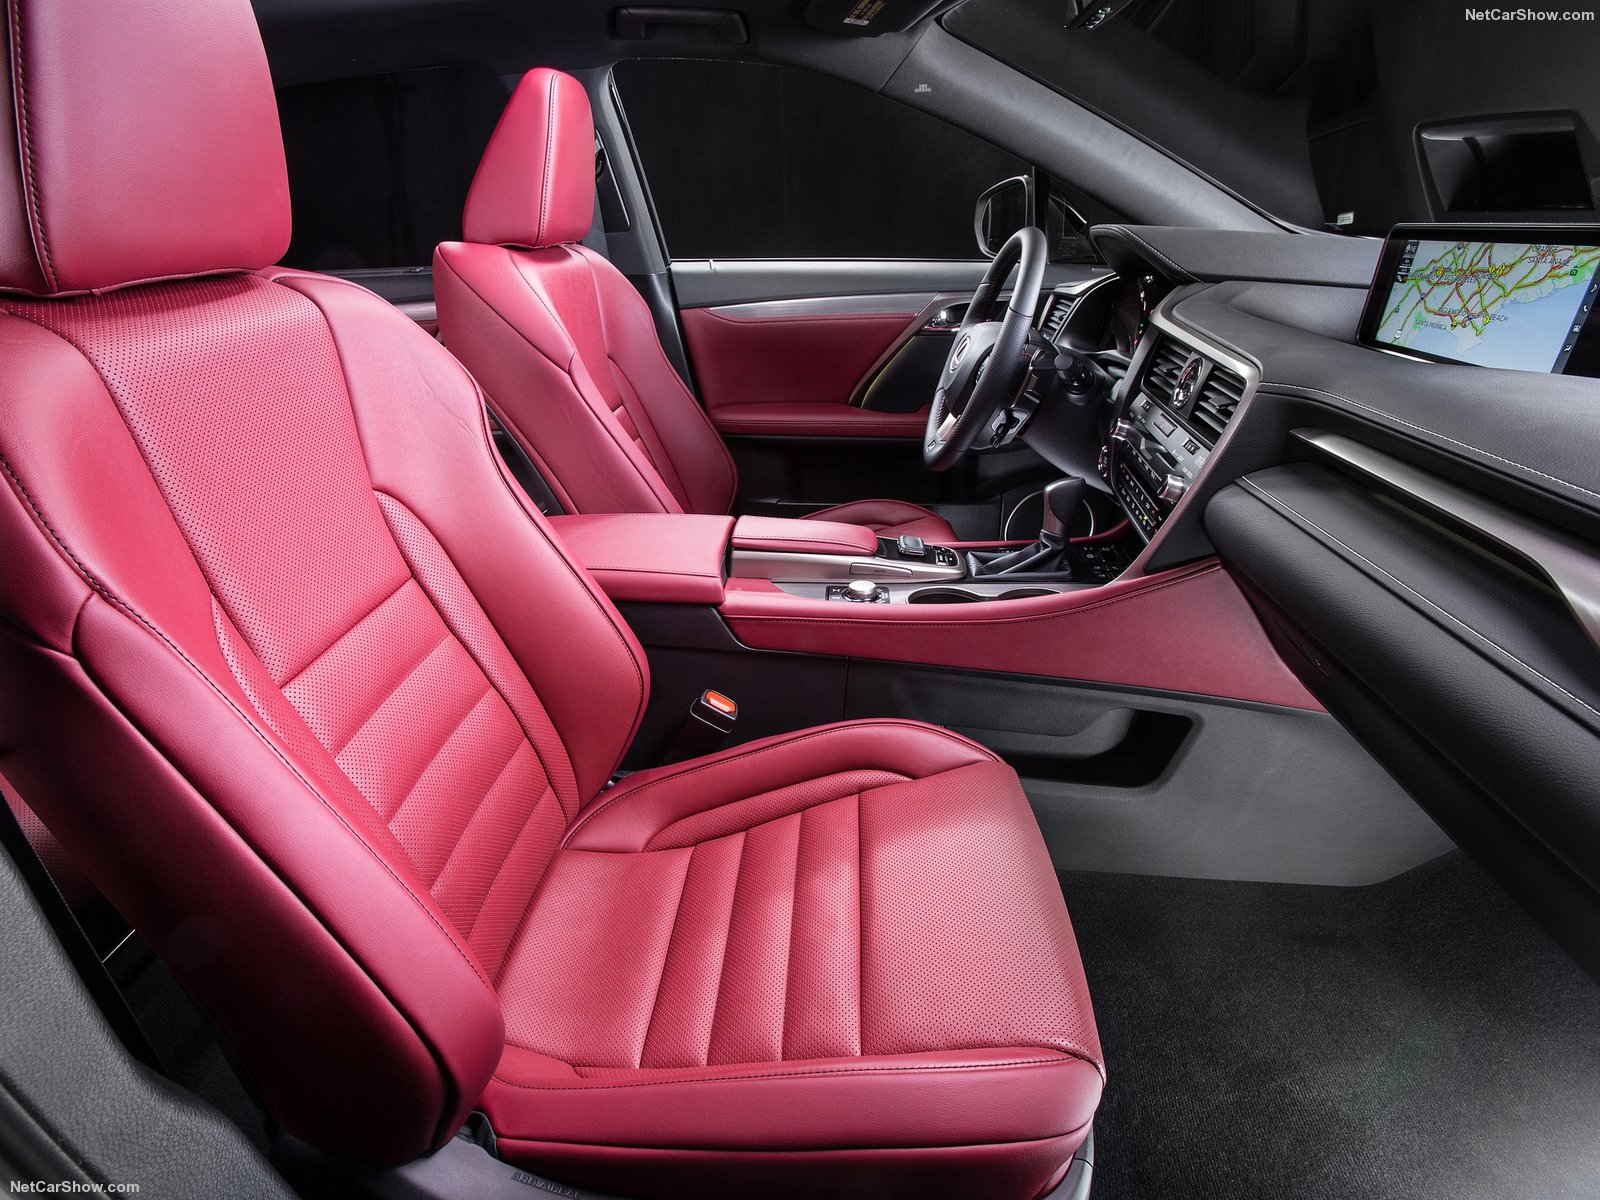 Передние сидения салона Лексус RX 300